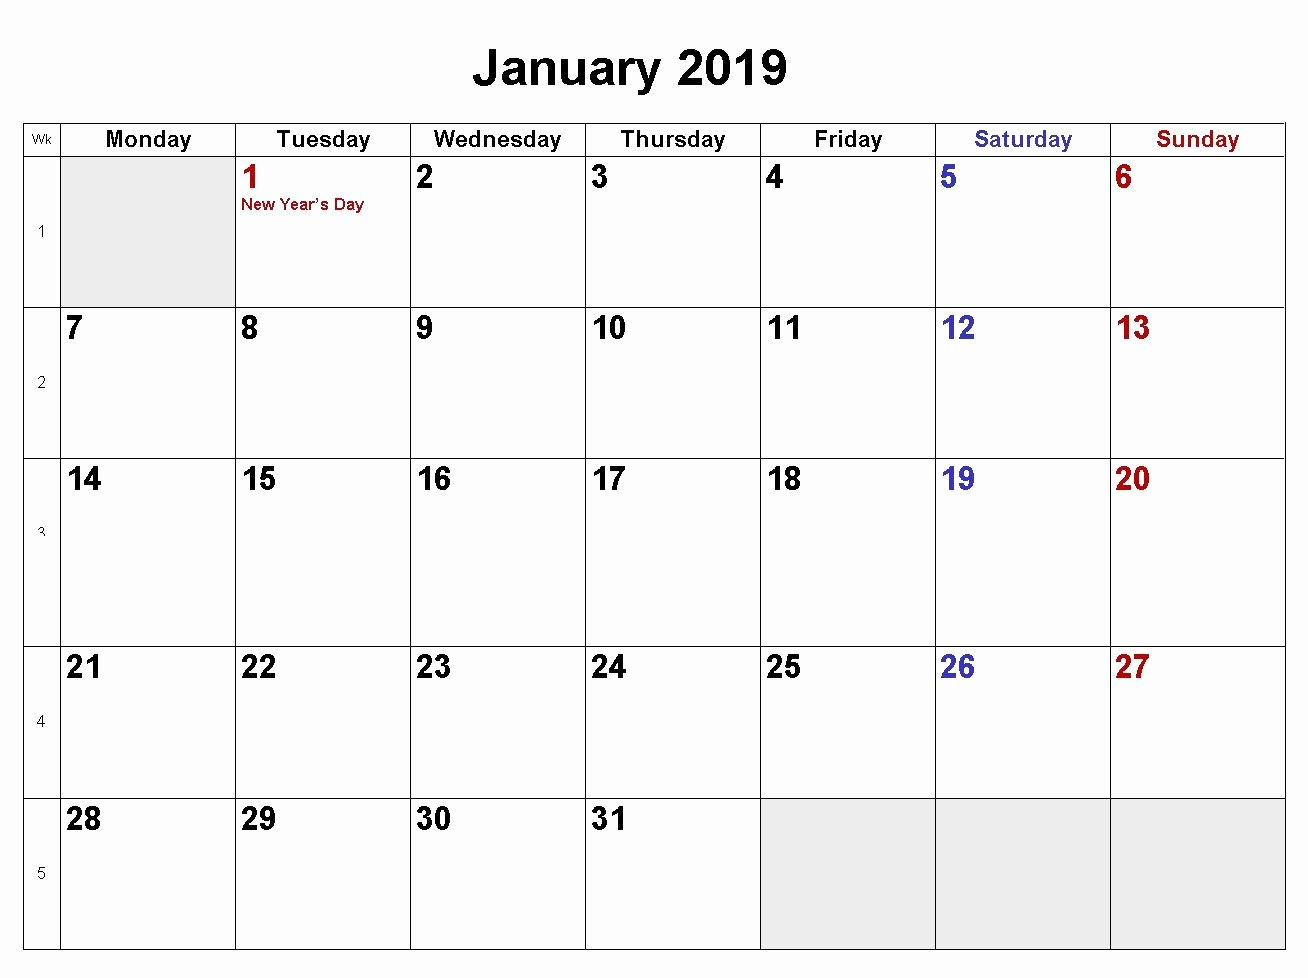 Microsoft Calendar Templates 2019 Elegant January 2019 Calendar Download In Word Excel Pdf formats